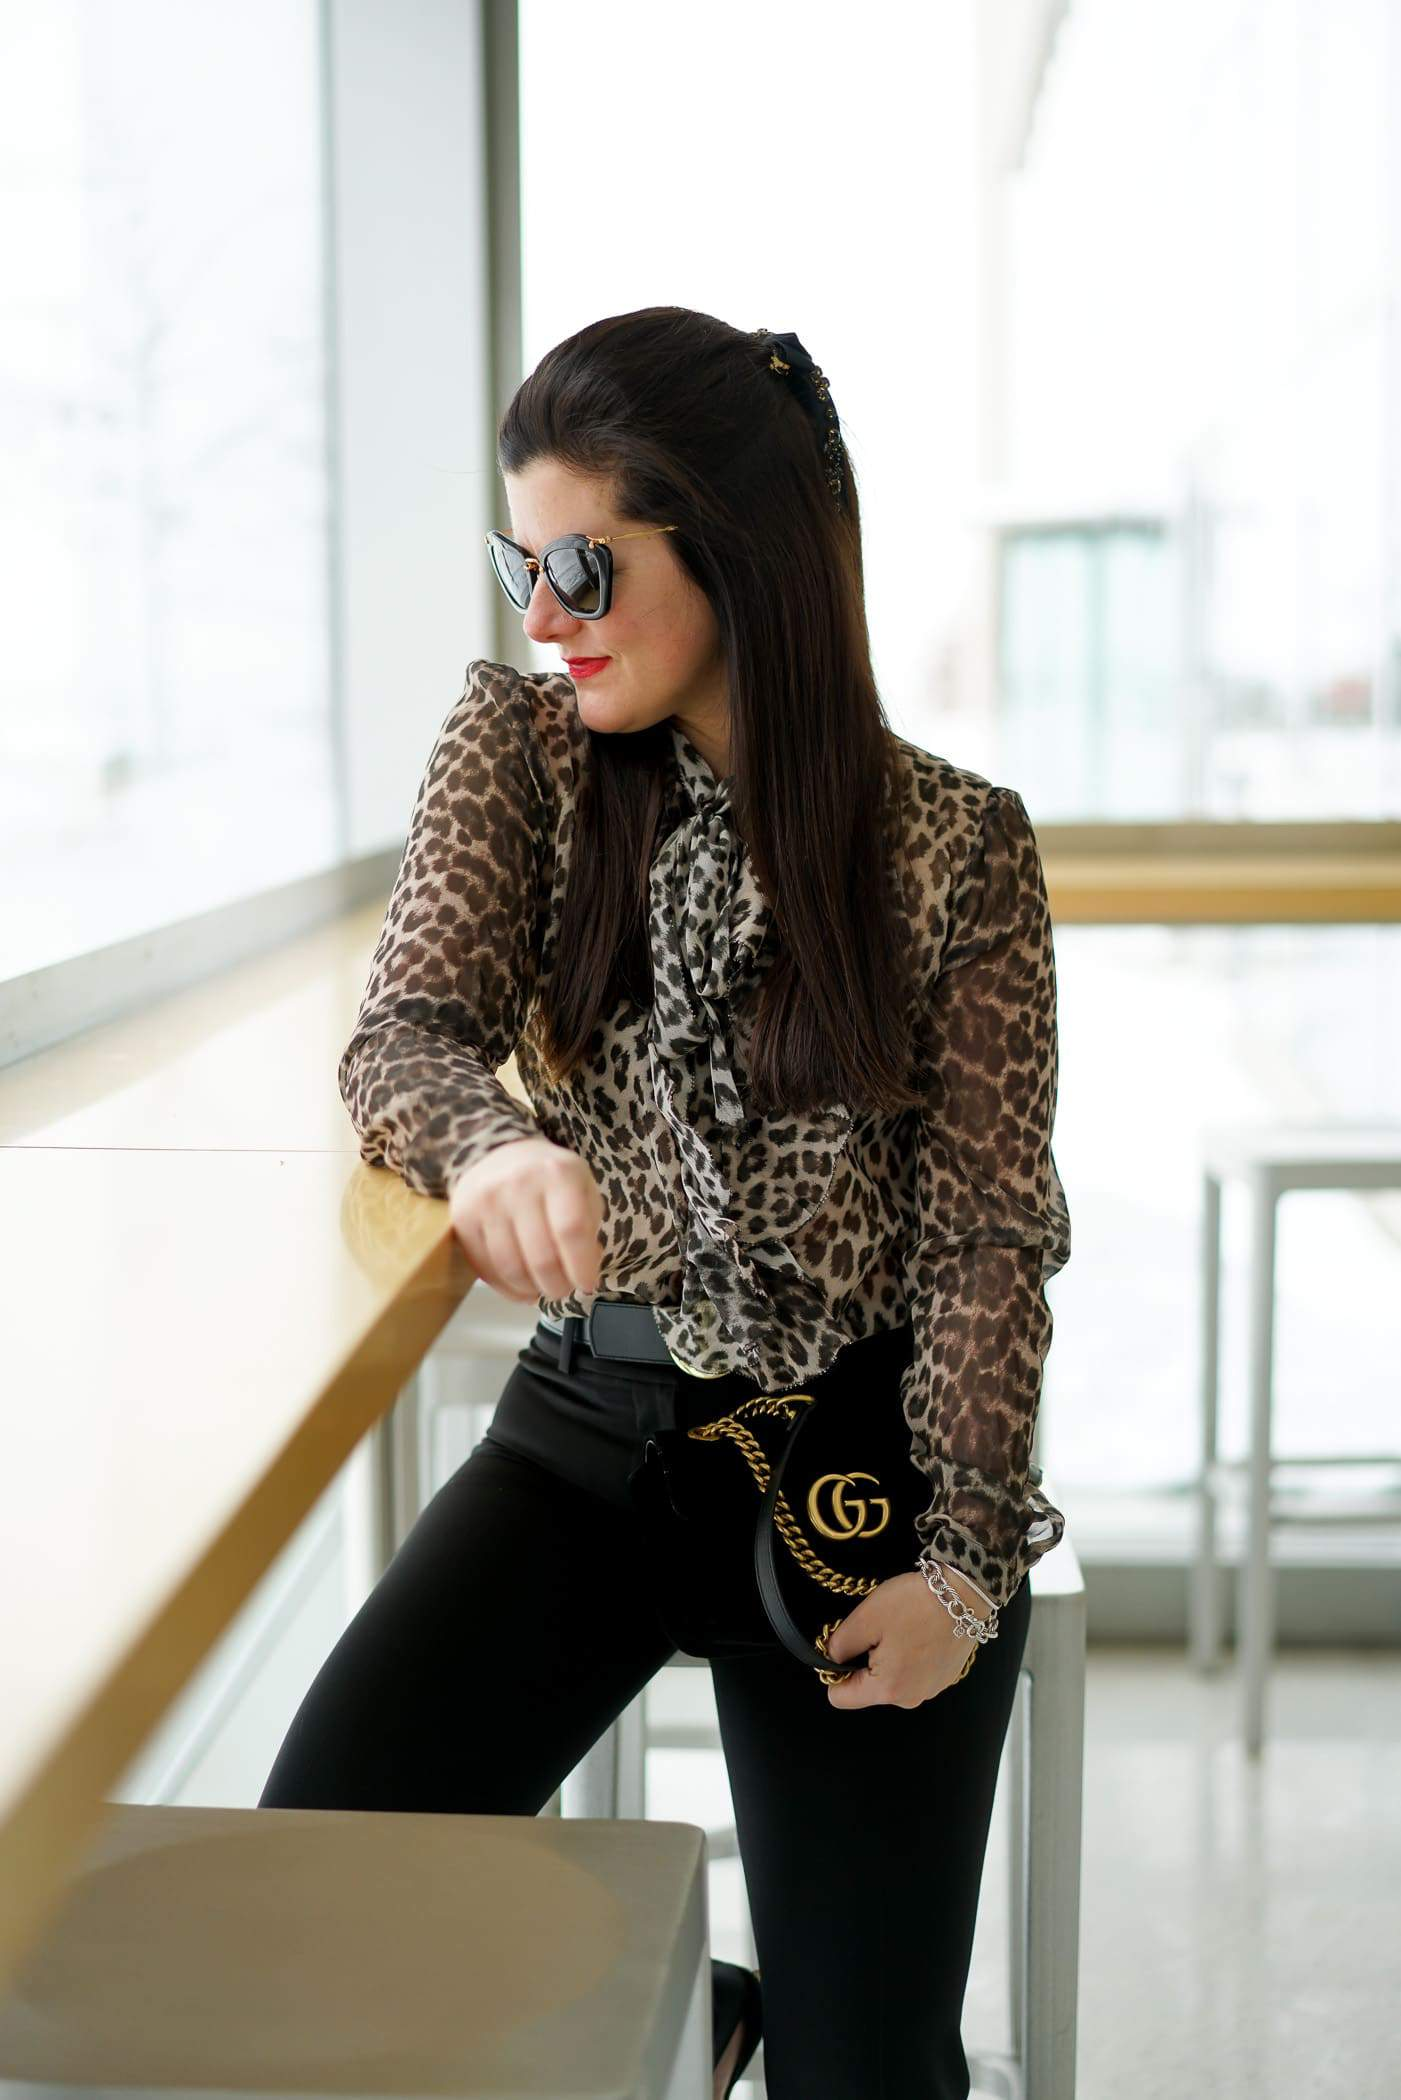 SILKNY LEOPARD BLOUSE, SILKNY faux fur coat, Gucci Marmont bag, Miu Miu sunglasses, Chicago Blogger, A Lily Love Affair